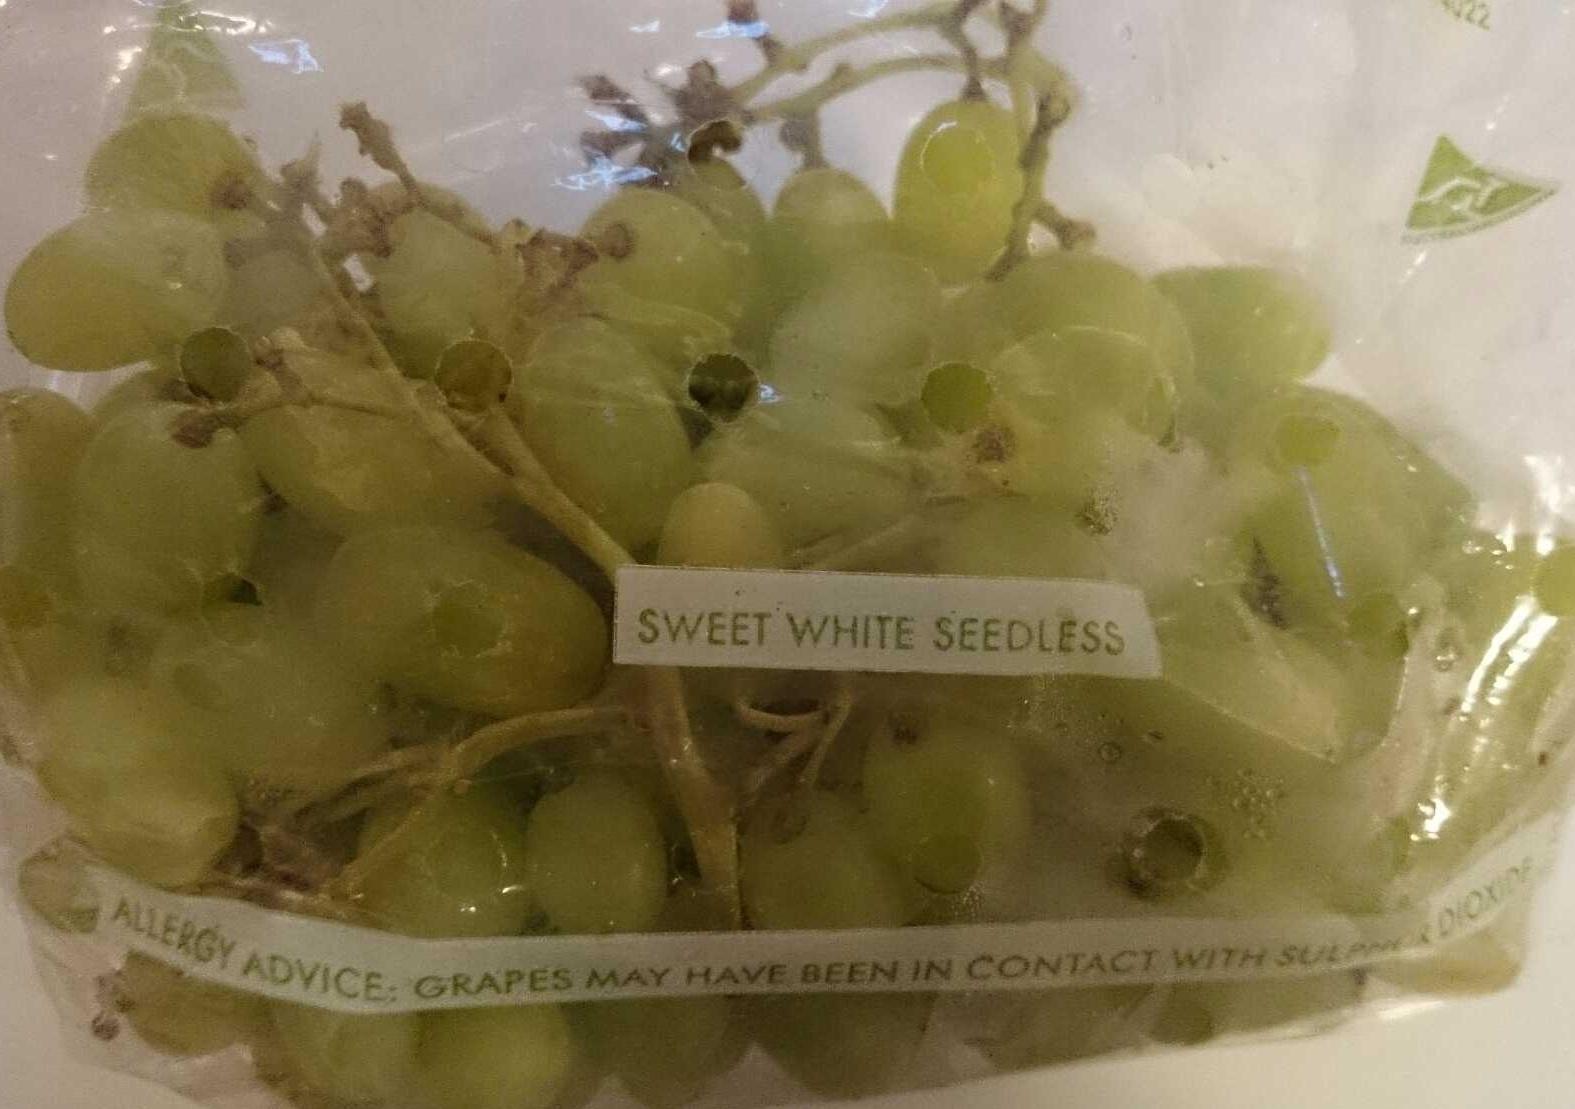 Sweet White Thompson Seedless Grapes - Product - en